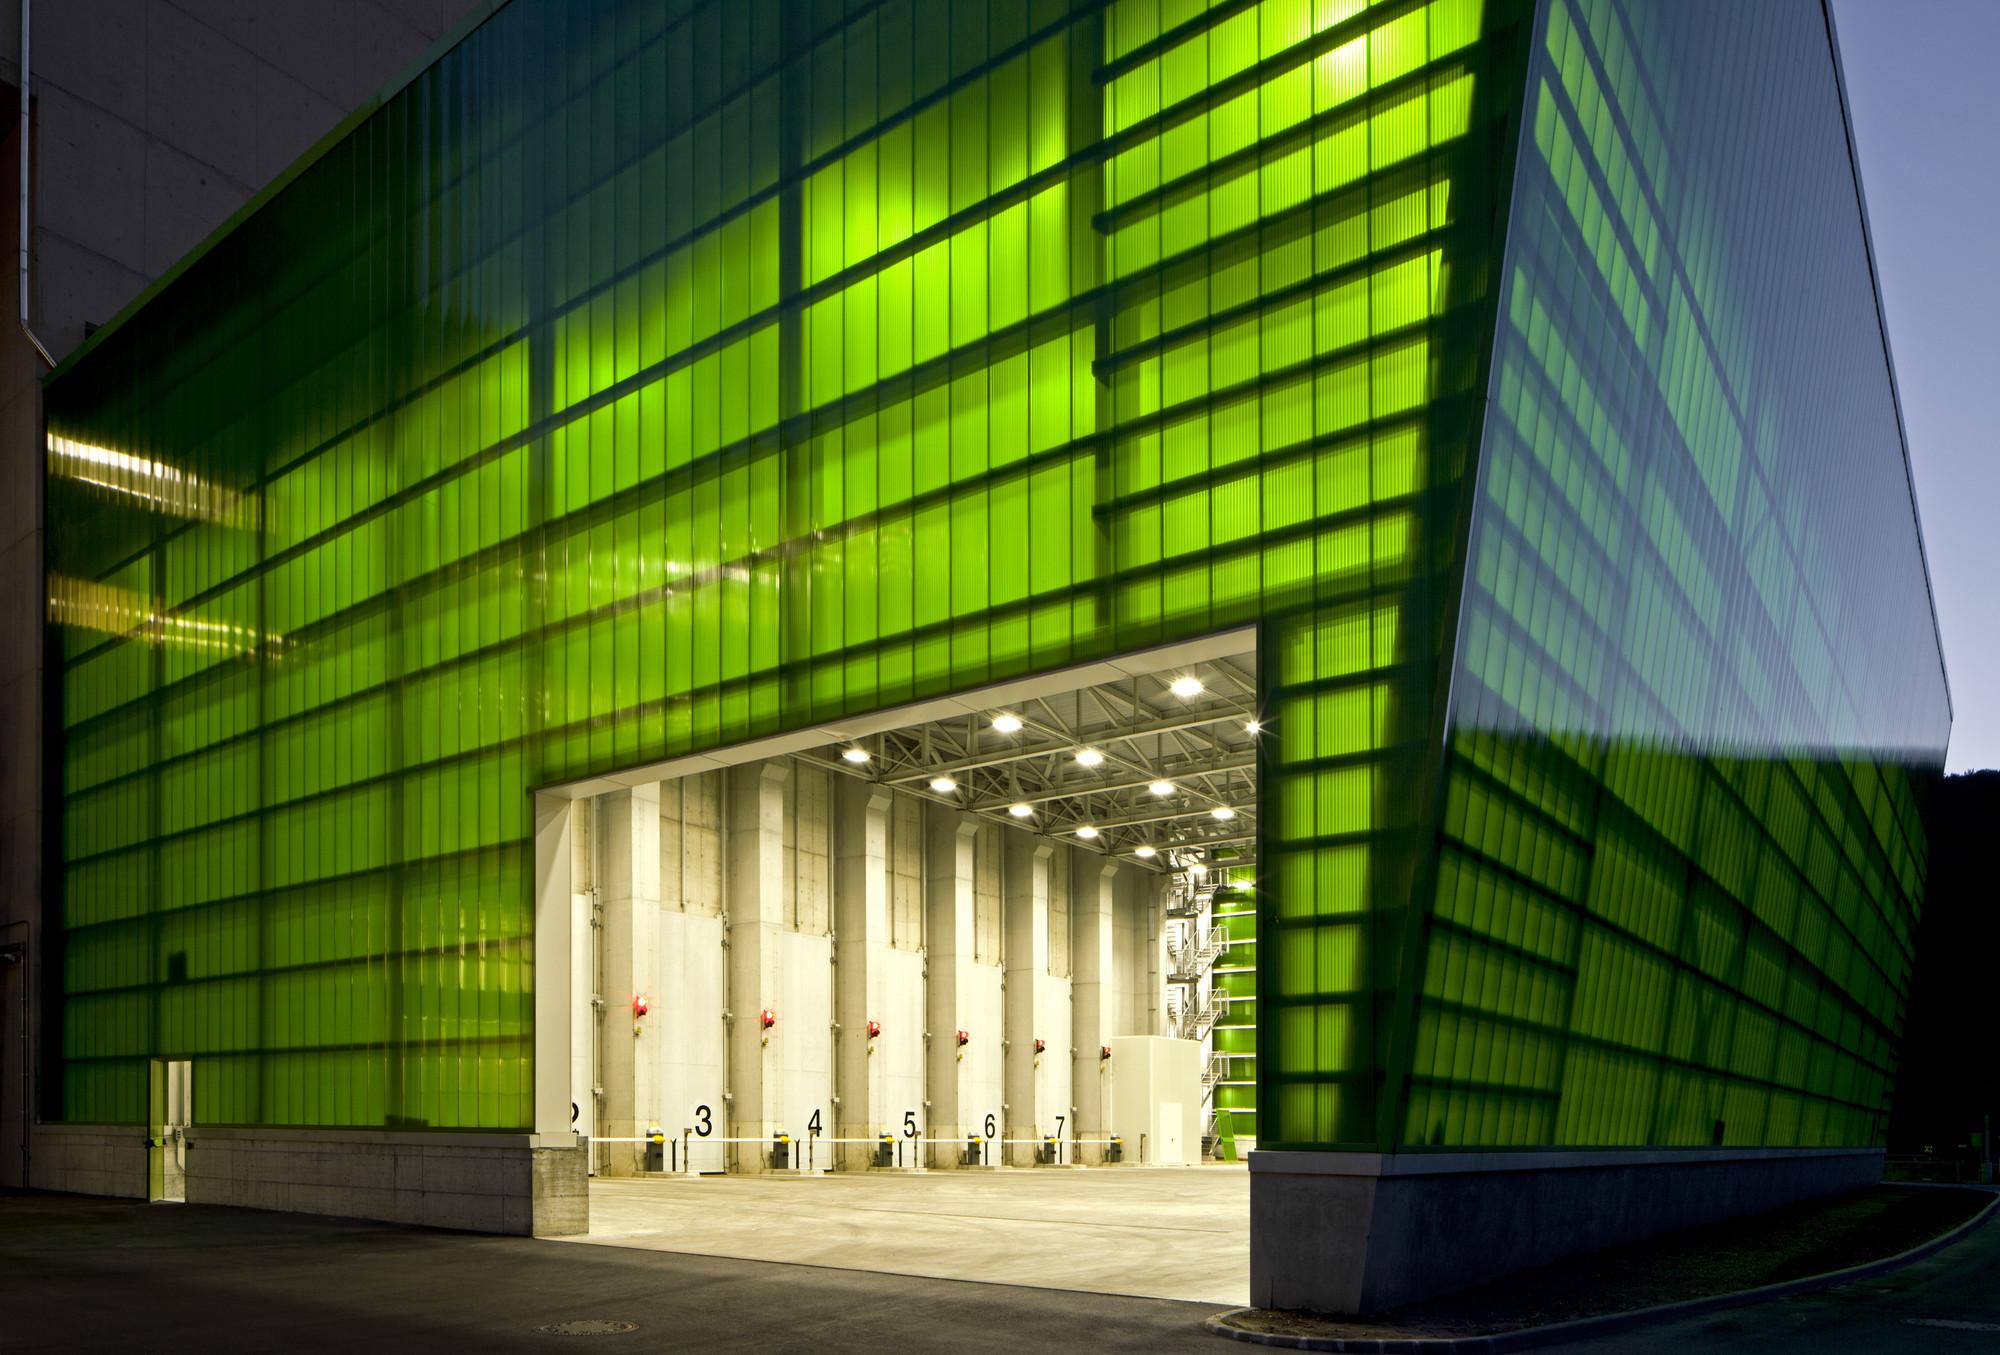 Usina de Energia a partir de Resíduos de Bolzano / Cl&aa Architects, © Alessandra Chemollo